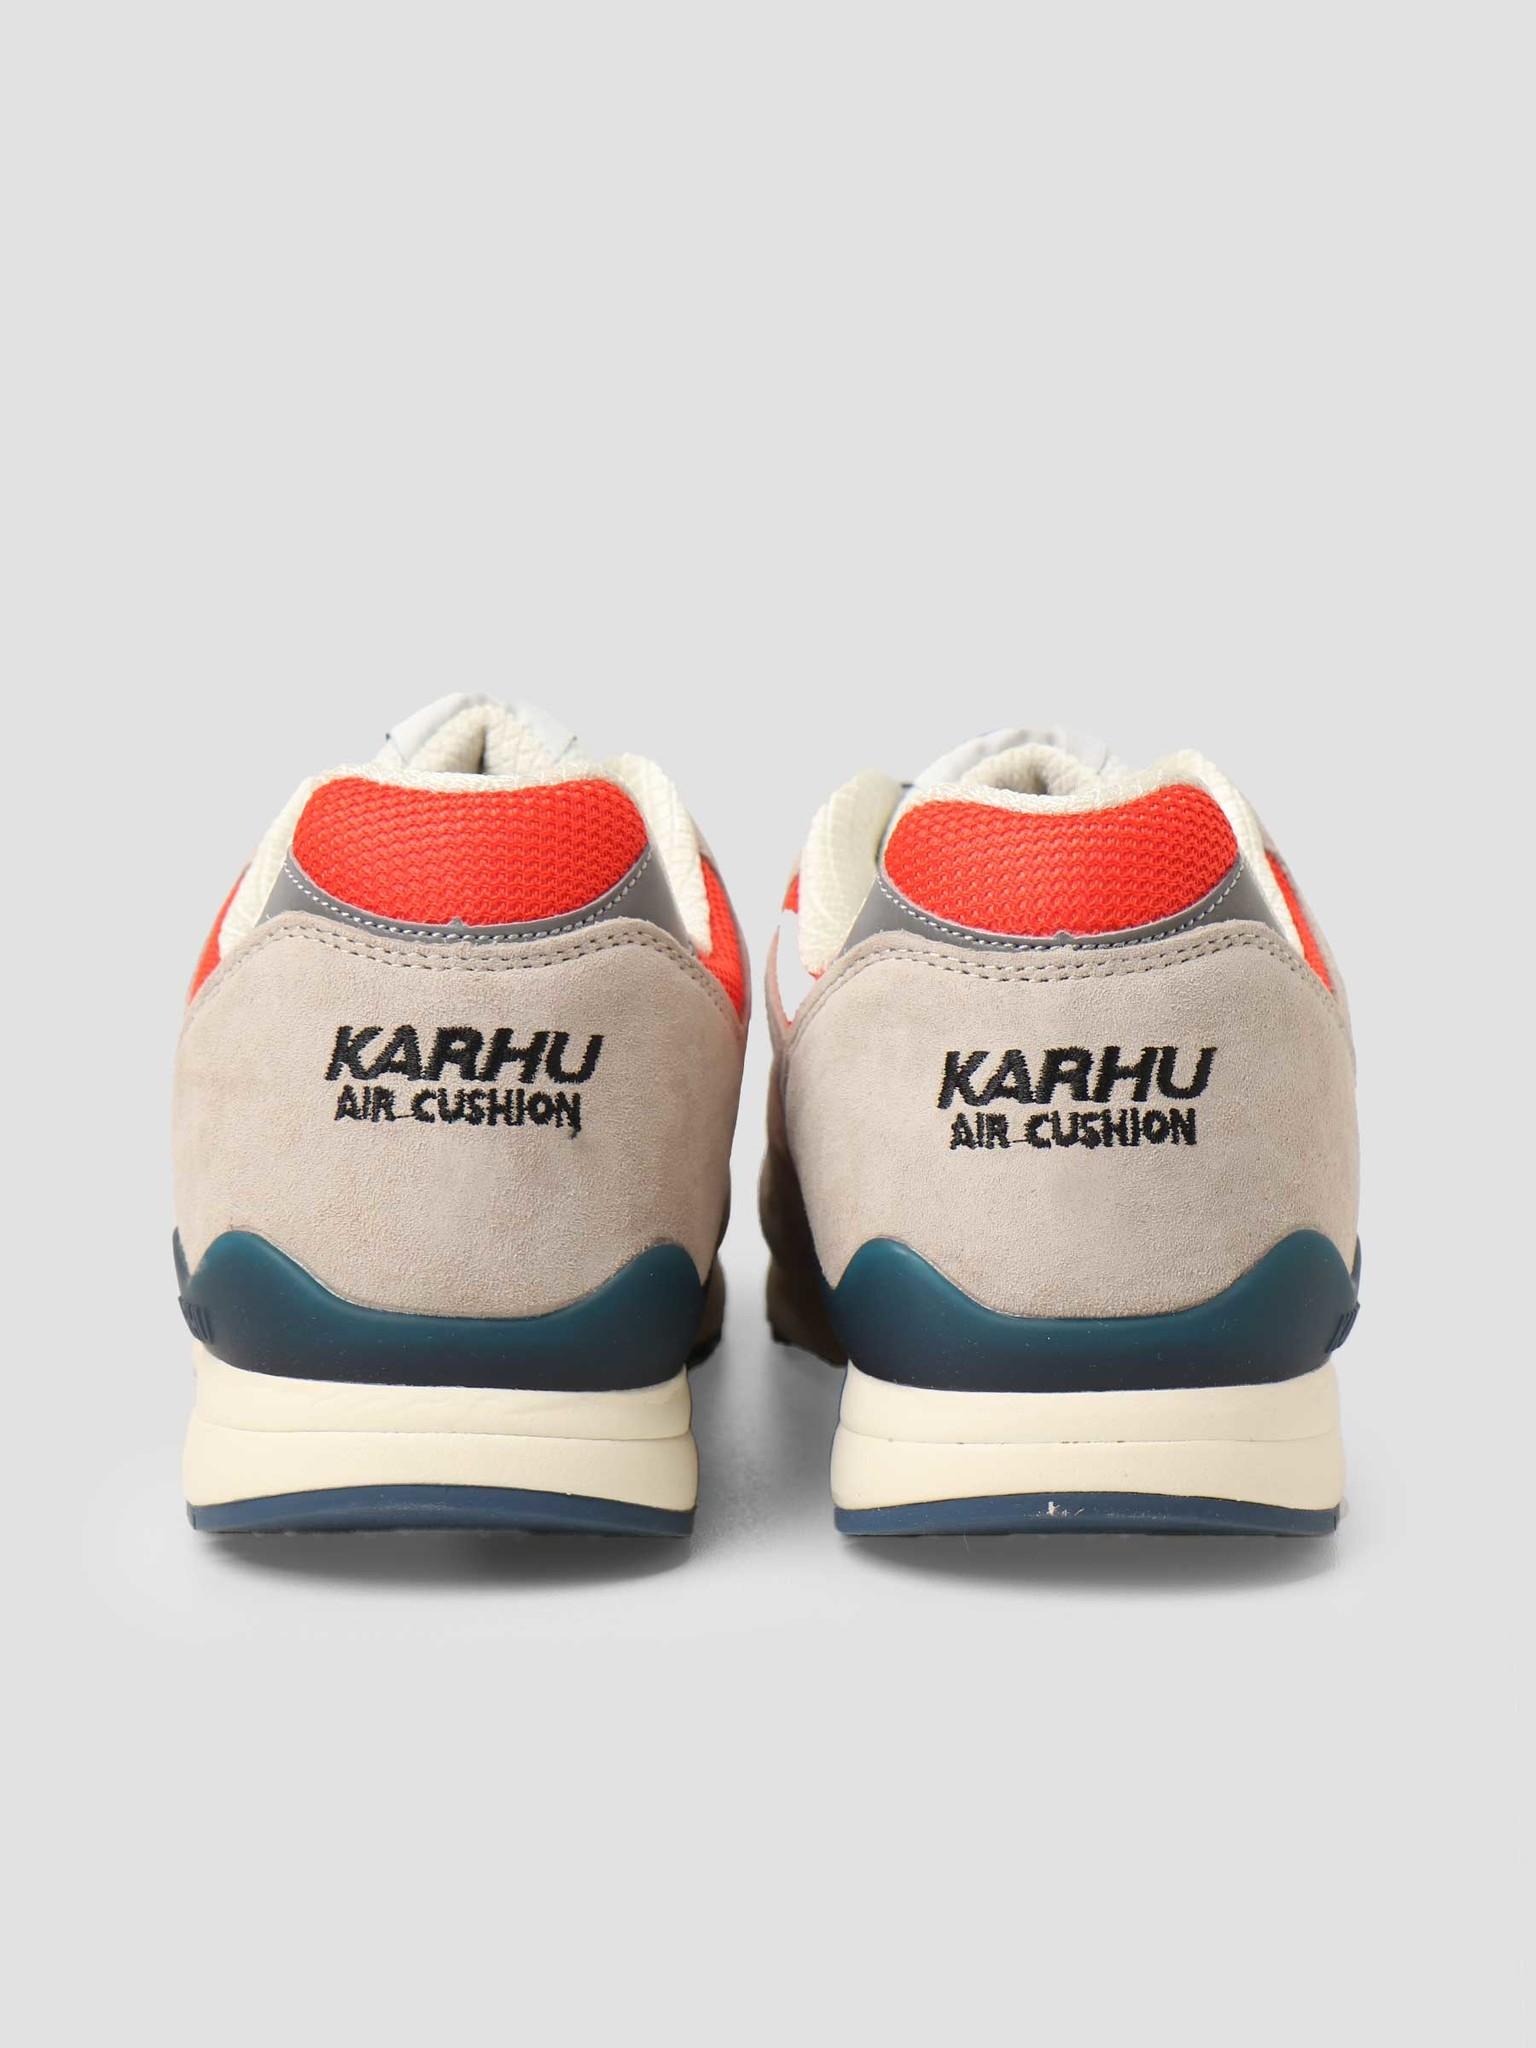 Karhu Karhu Synchron Classic Rainy Day Jade Cream F802657